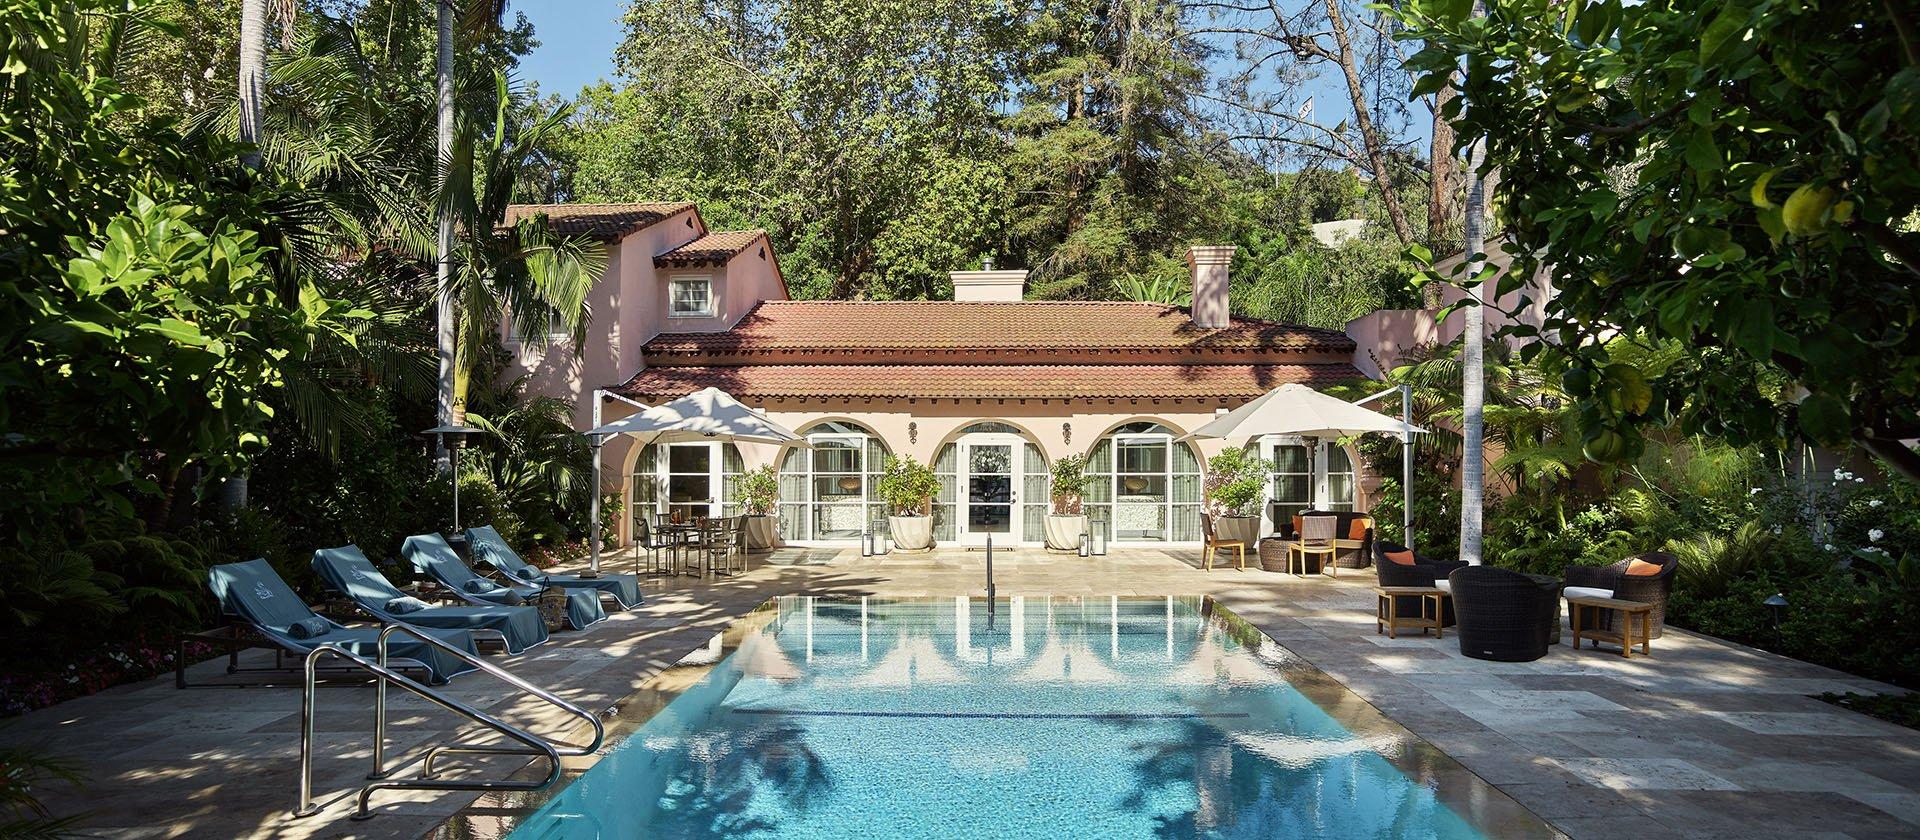 Rooms & Suites - Los Angeles - Hotel Bel-Air | Dorchester